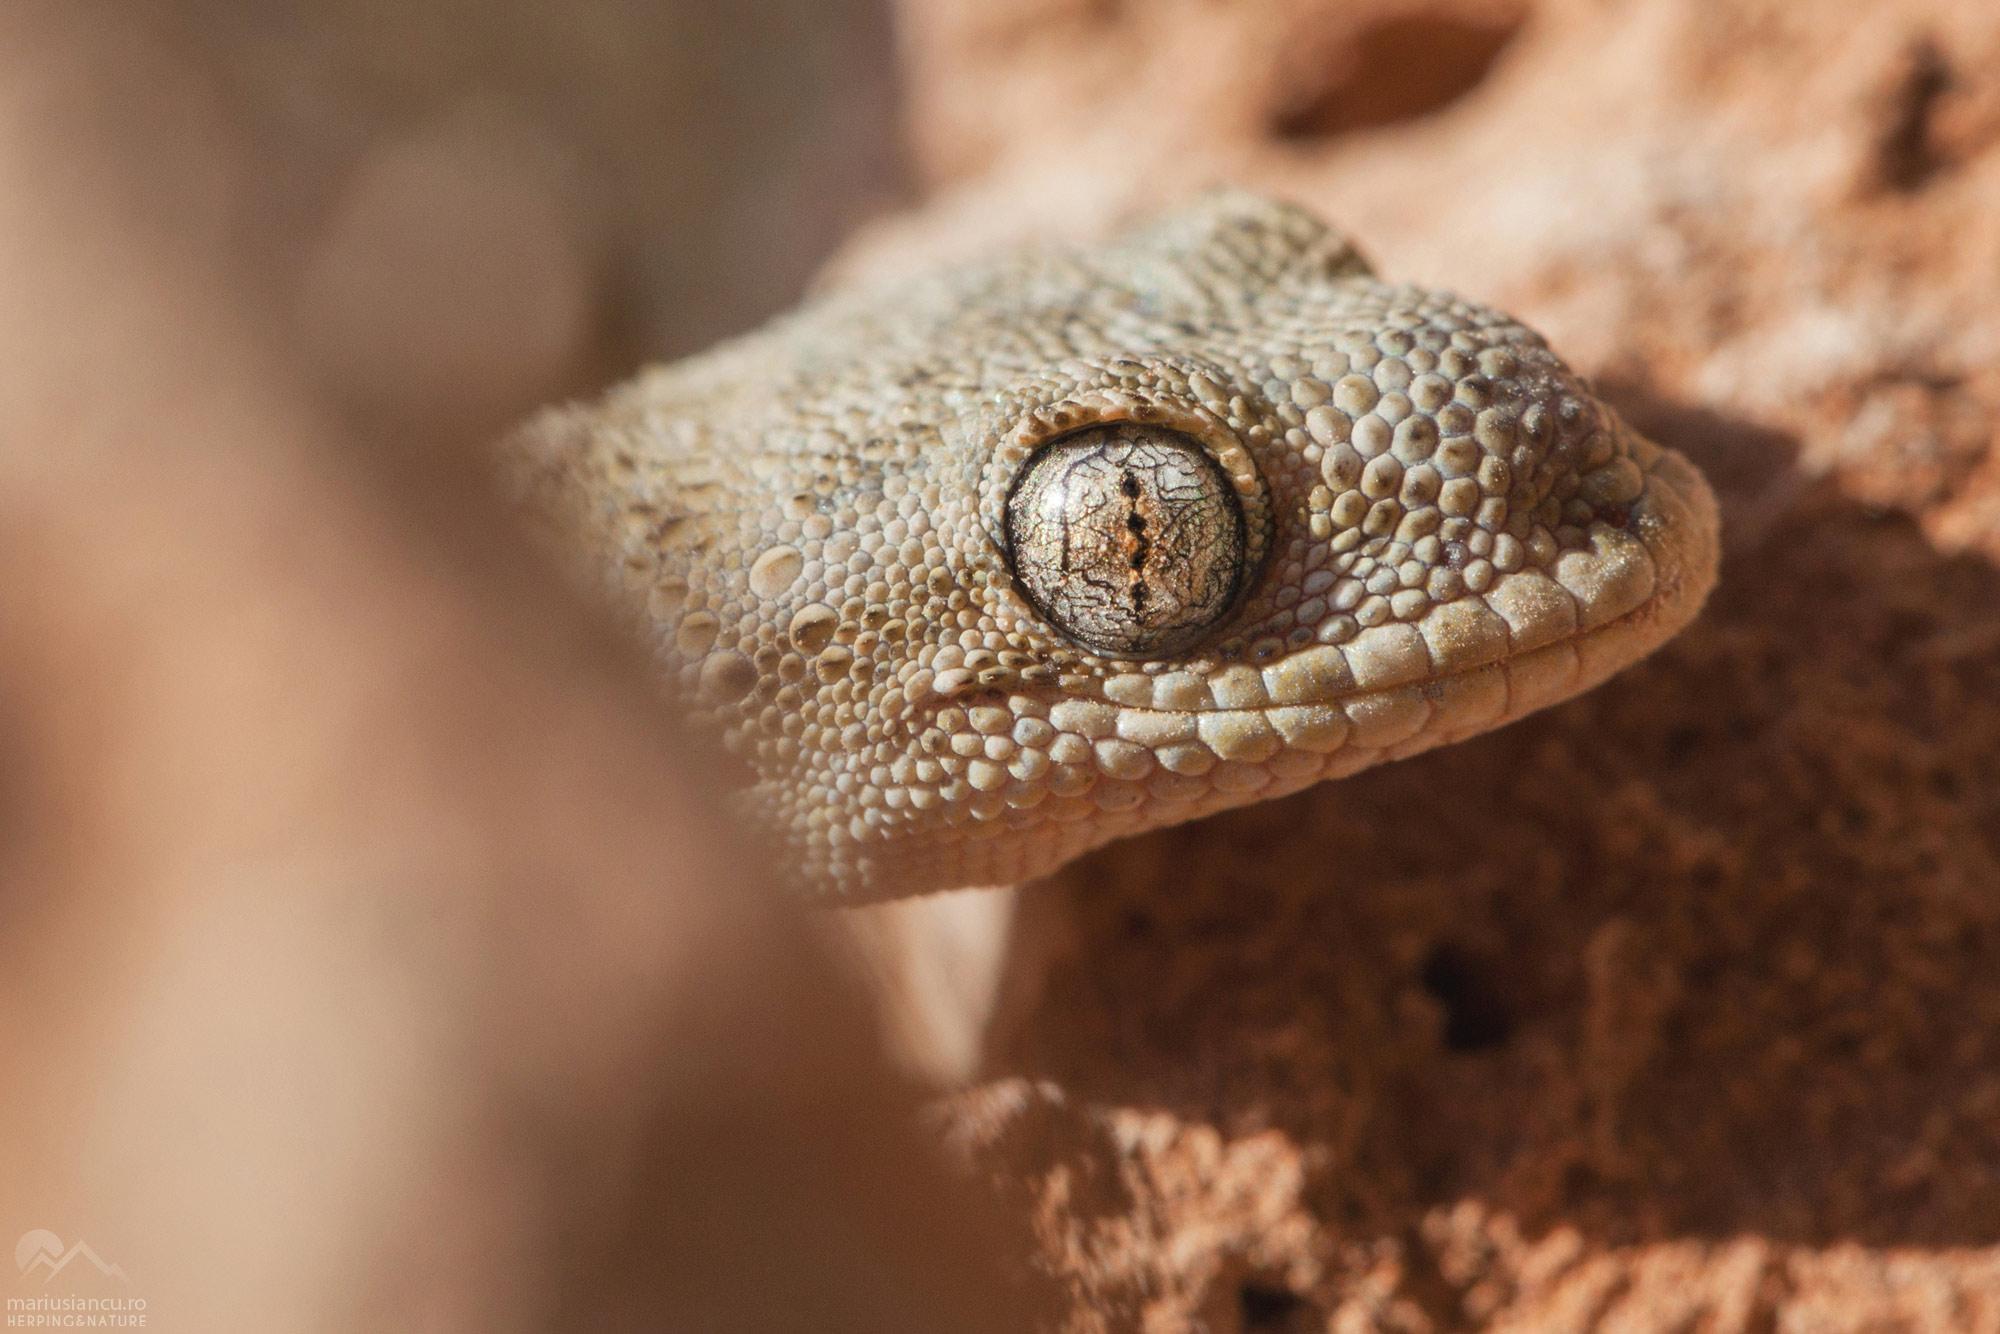 populatie de gecko descoperita in Bucuresti